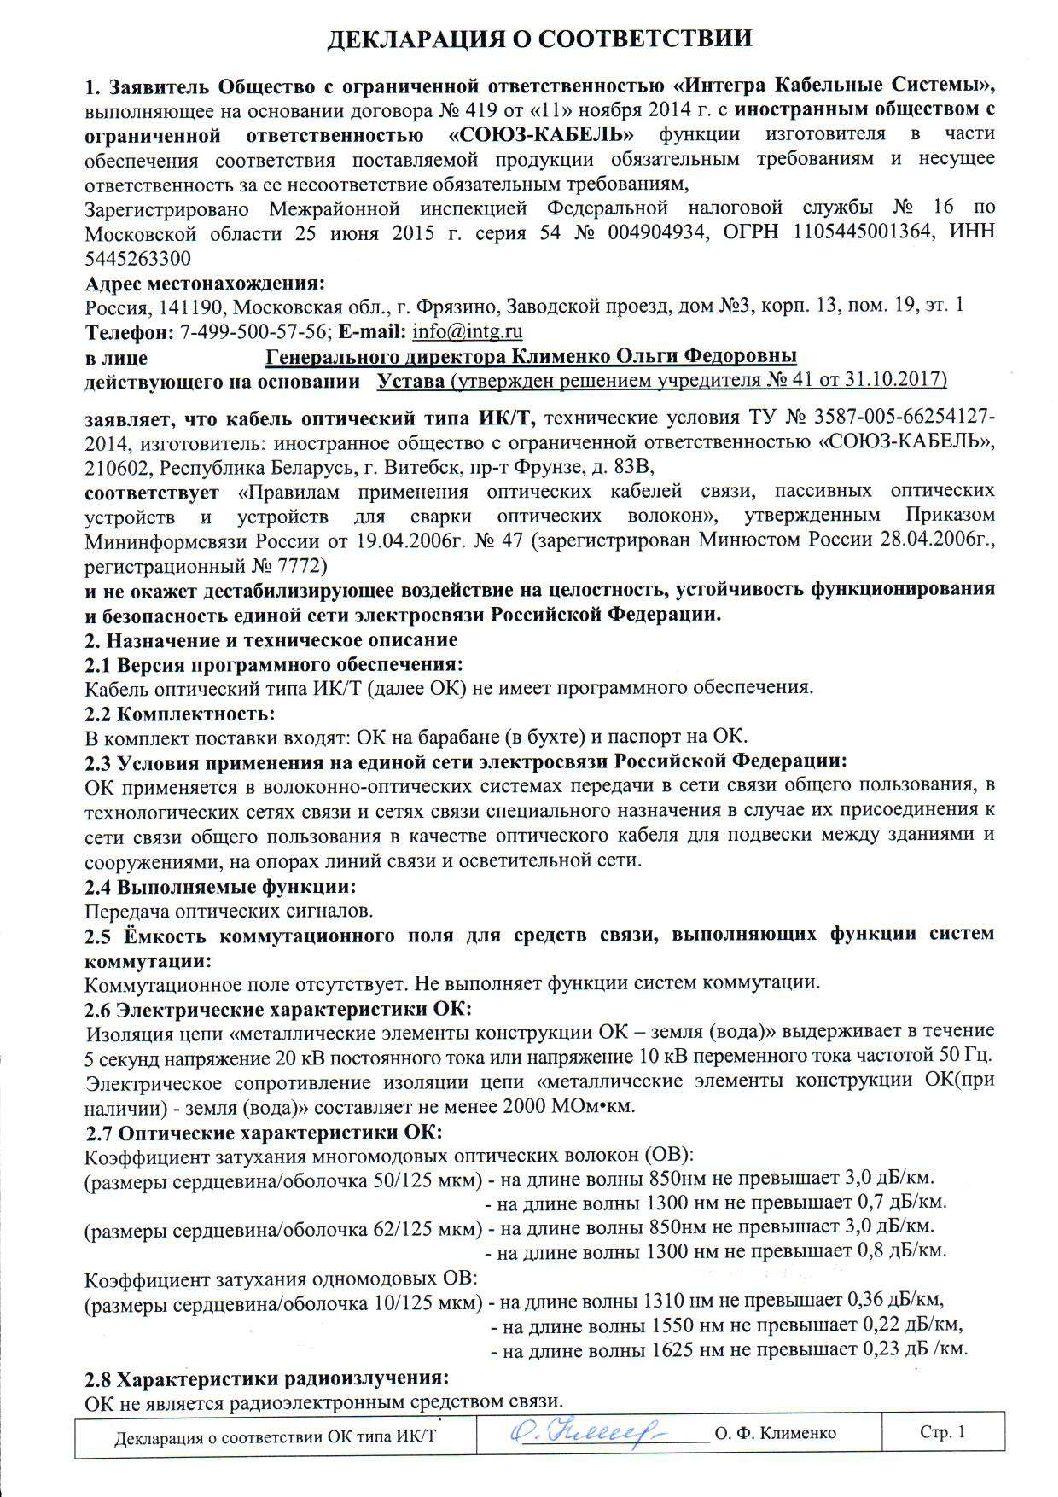 Declaration IK/T